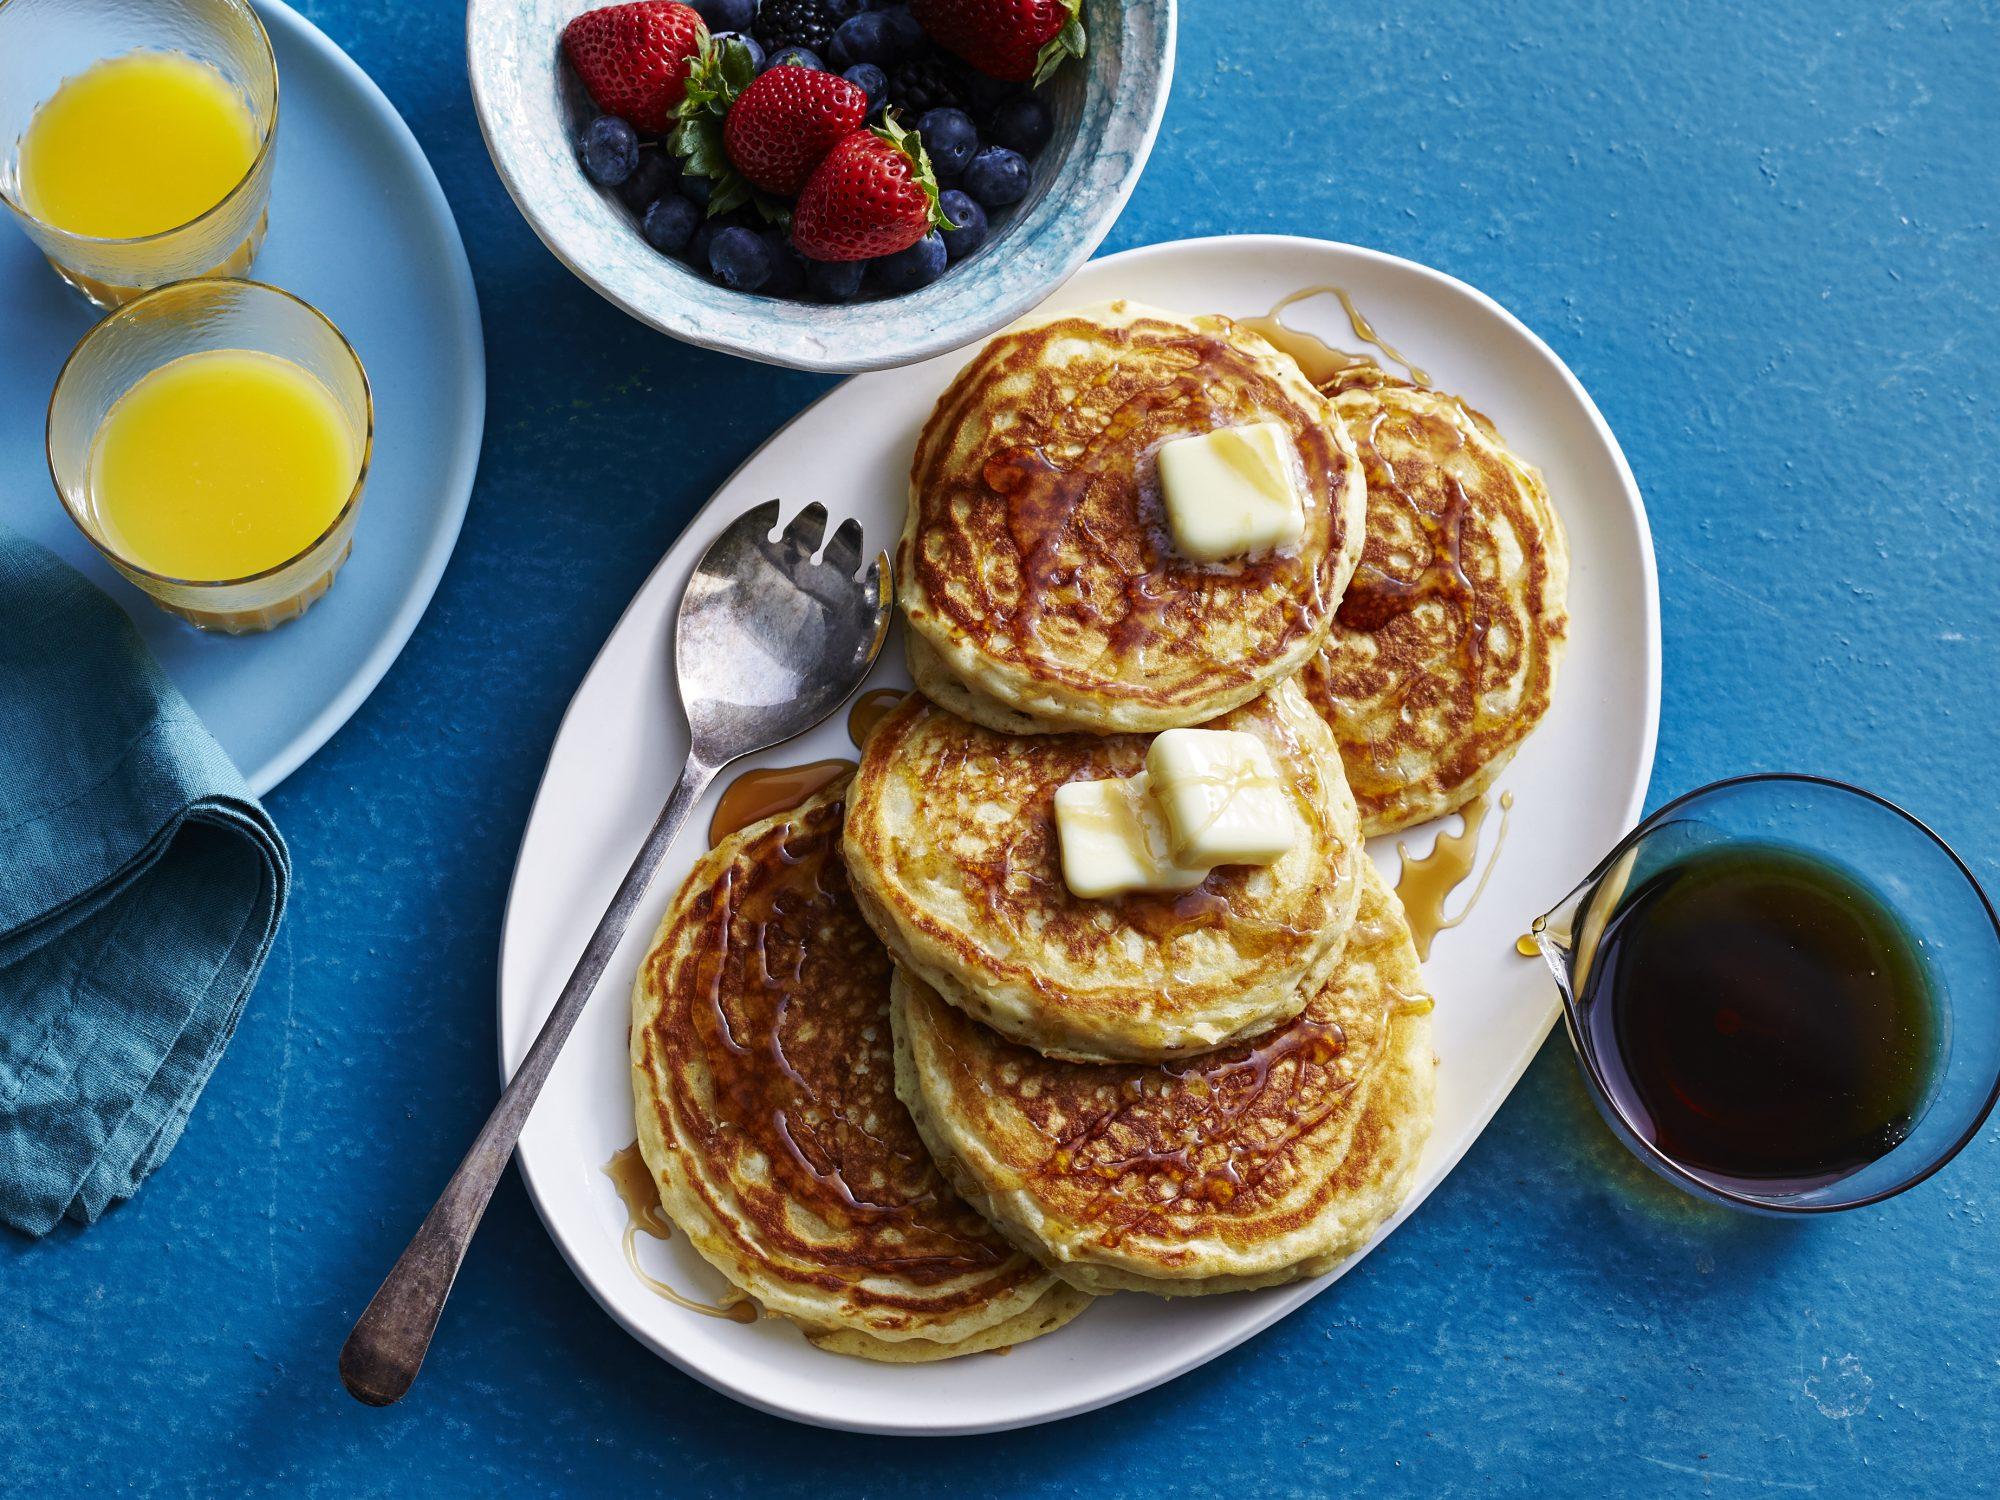 mr-basic-buttermilk-pancakes-image